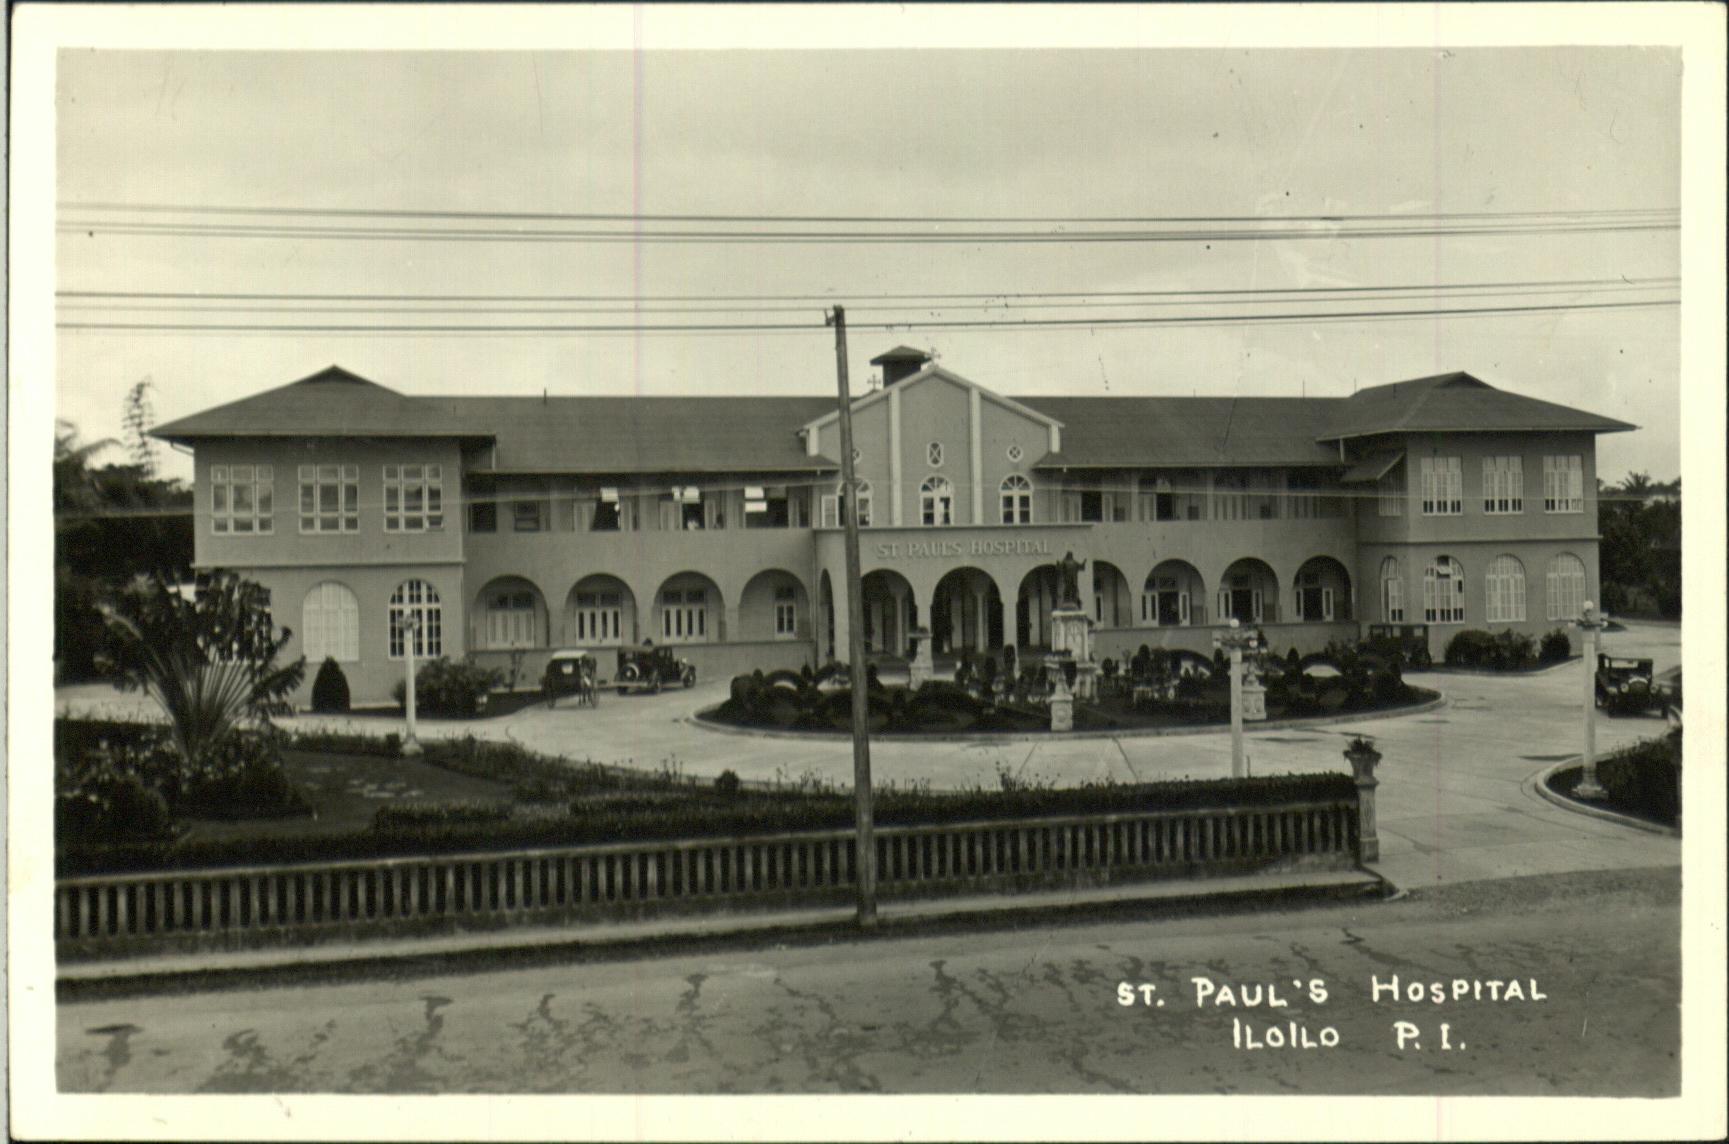 Exterior view of Saint Paul's Hospital in Iloilo City, Iloilo, 1920